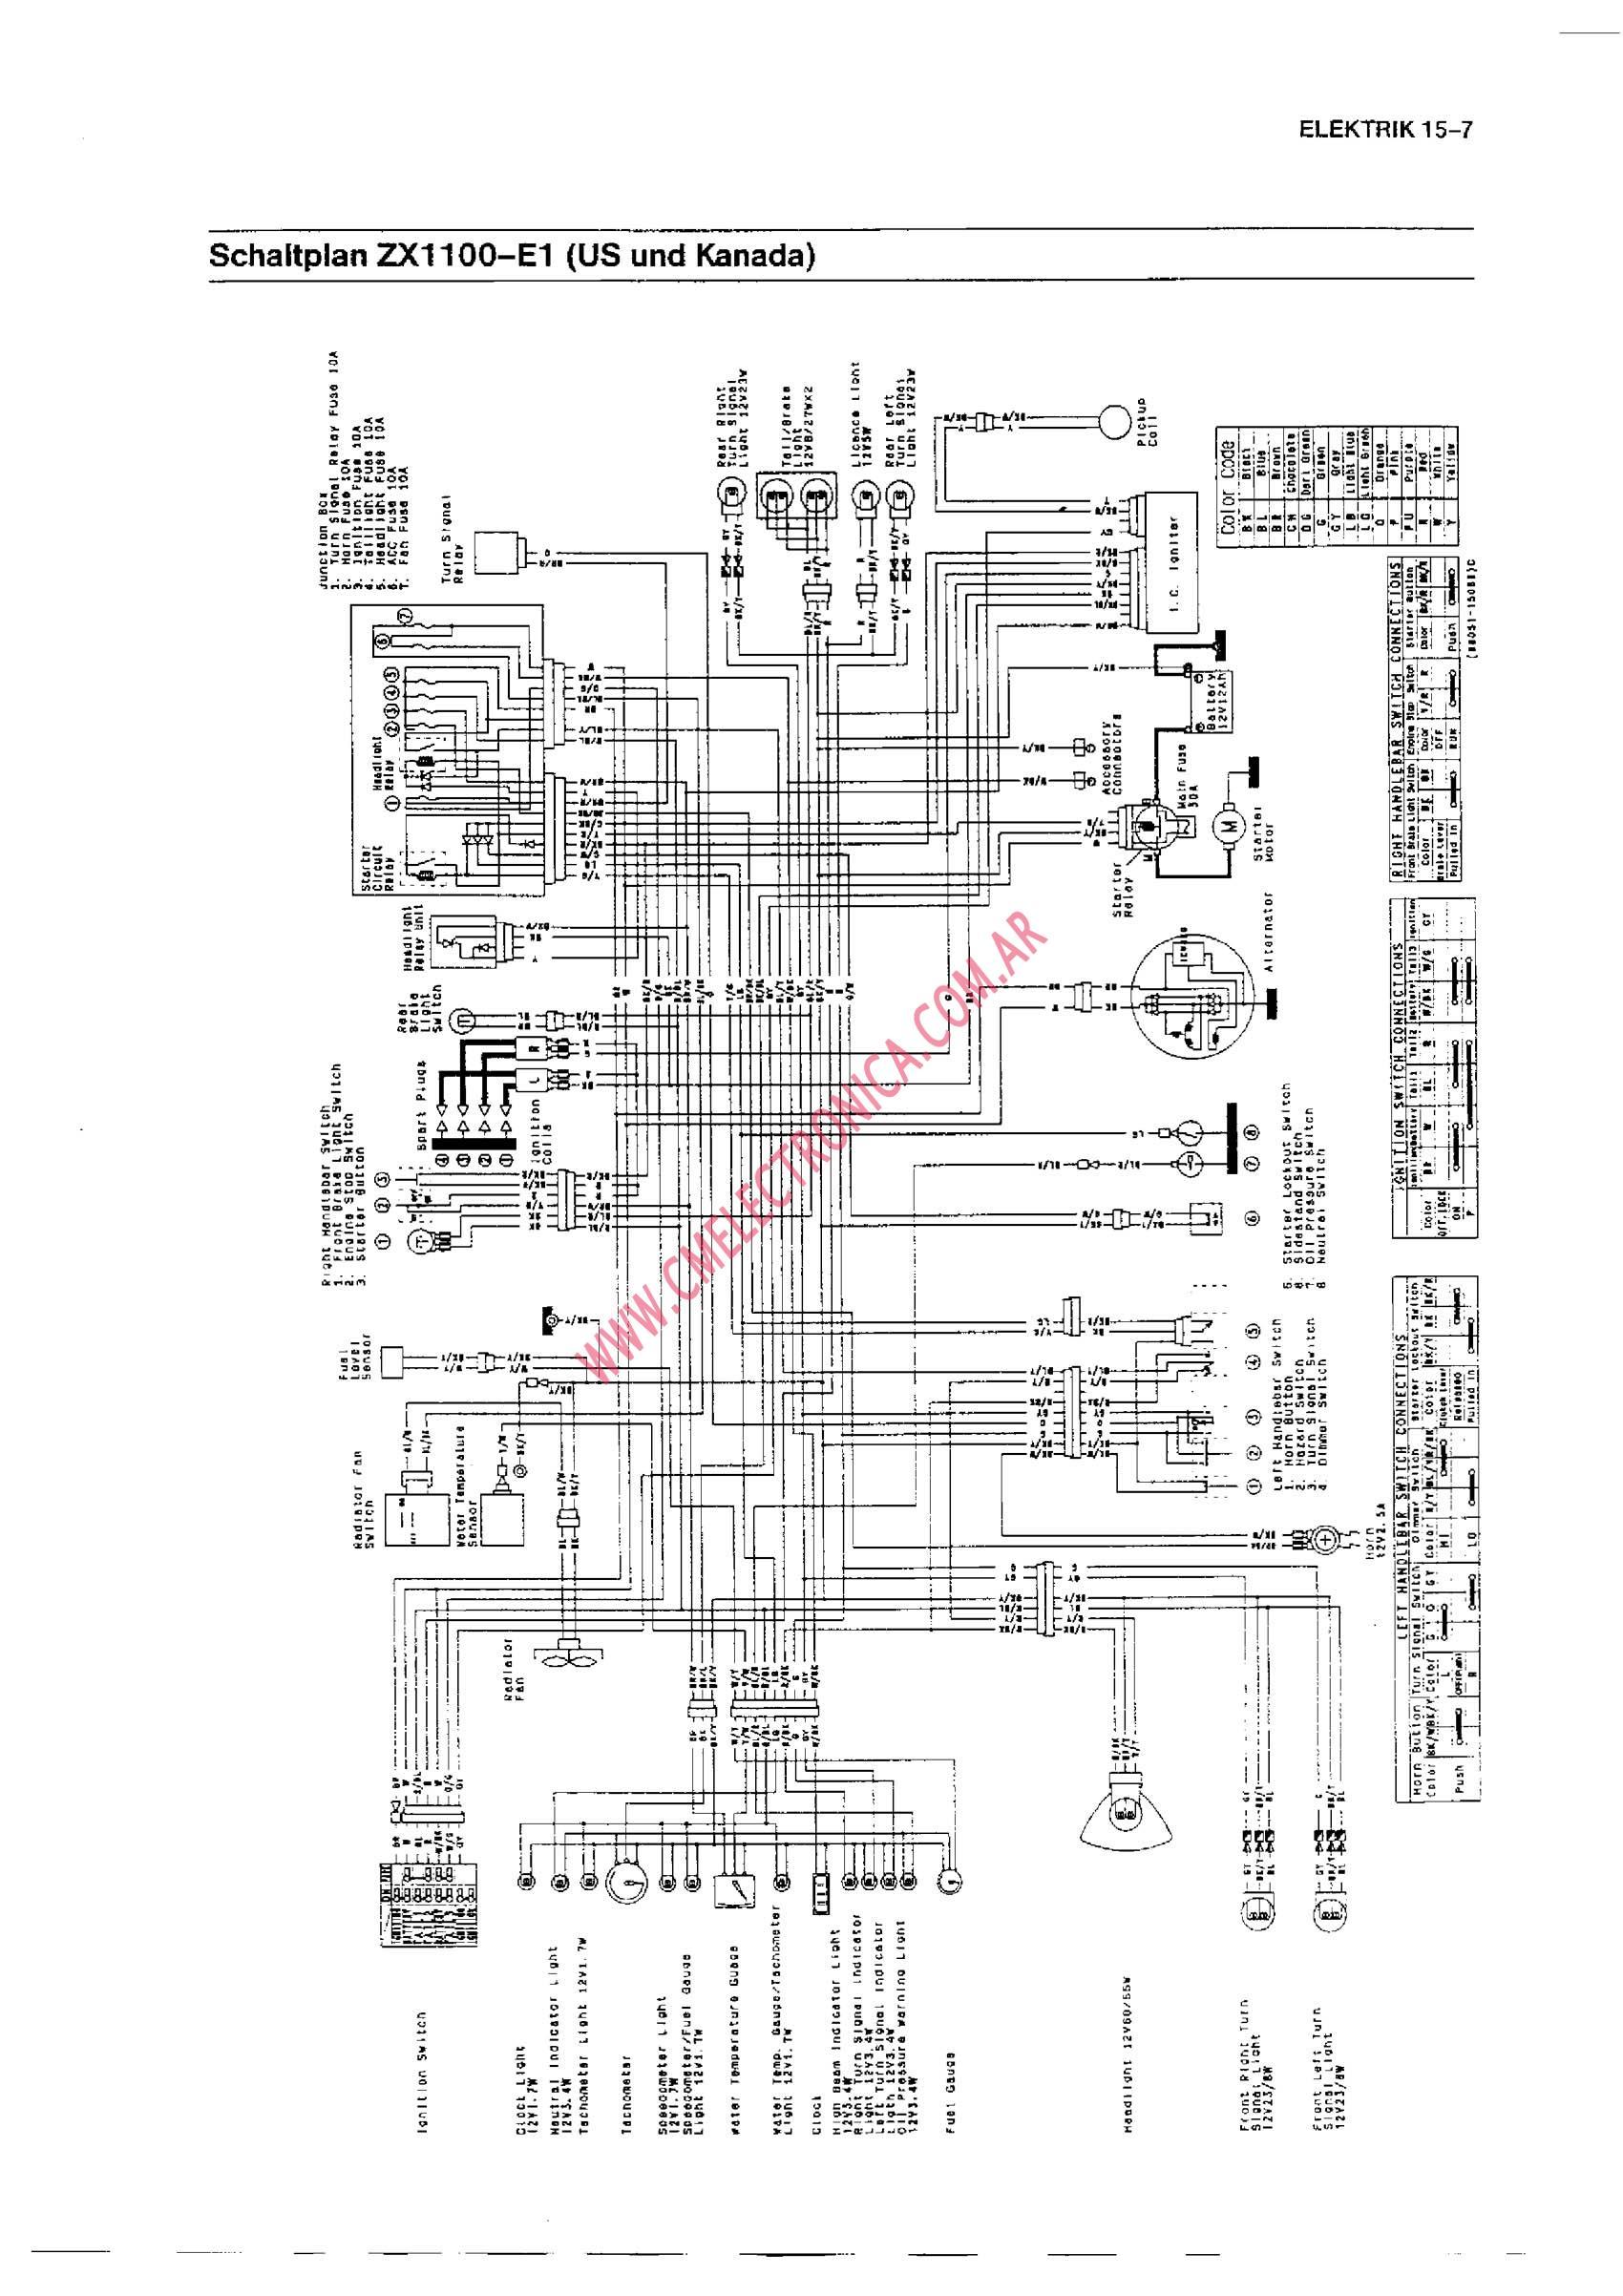 Kawasaki gpz 1100 manual pdf